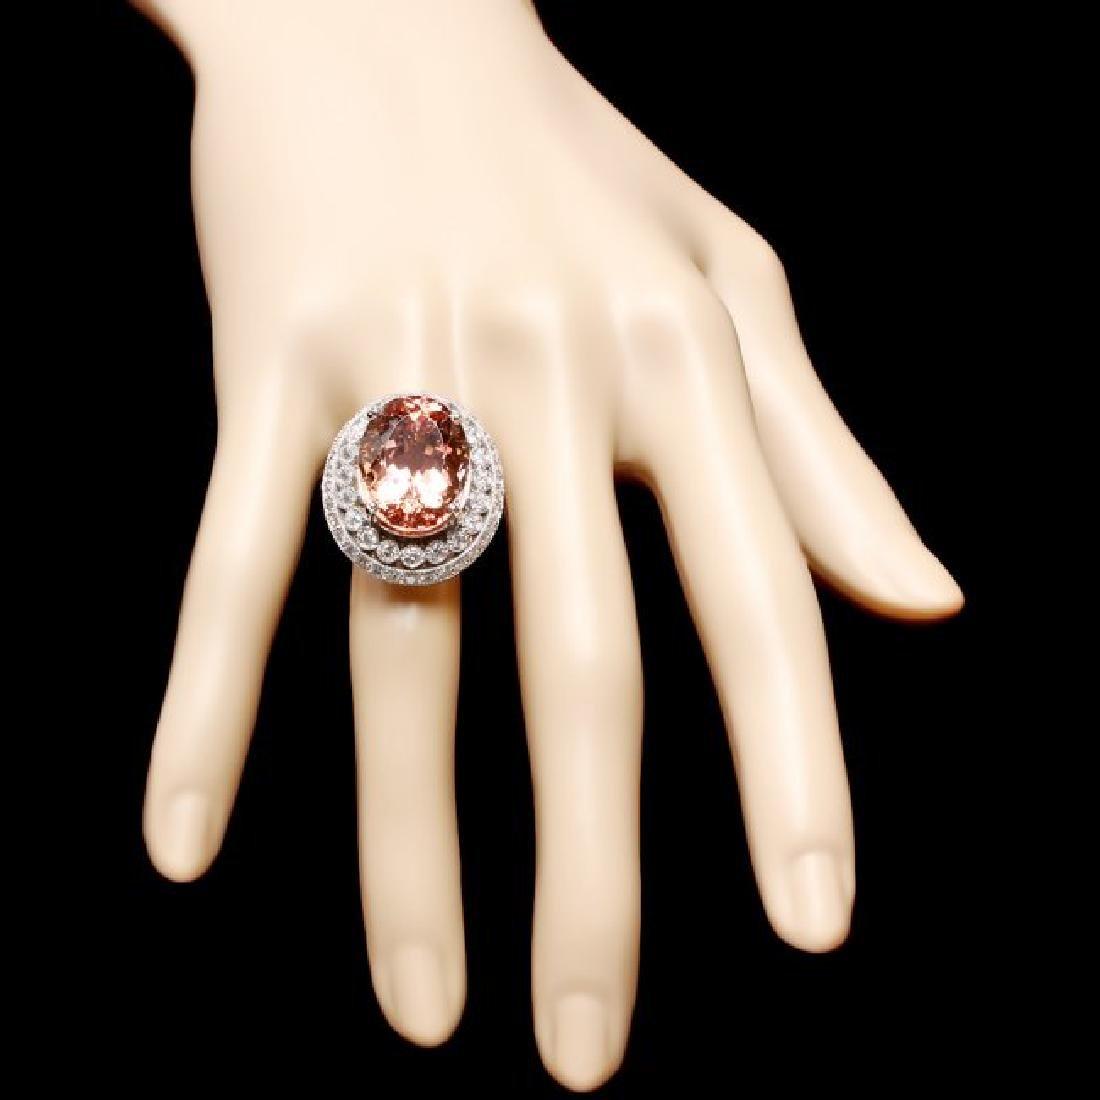 14k Gold 16.20ct Morganite 1.85ct Diamond Ring - 4